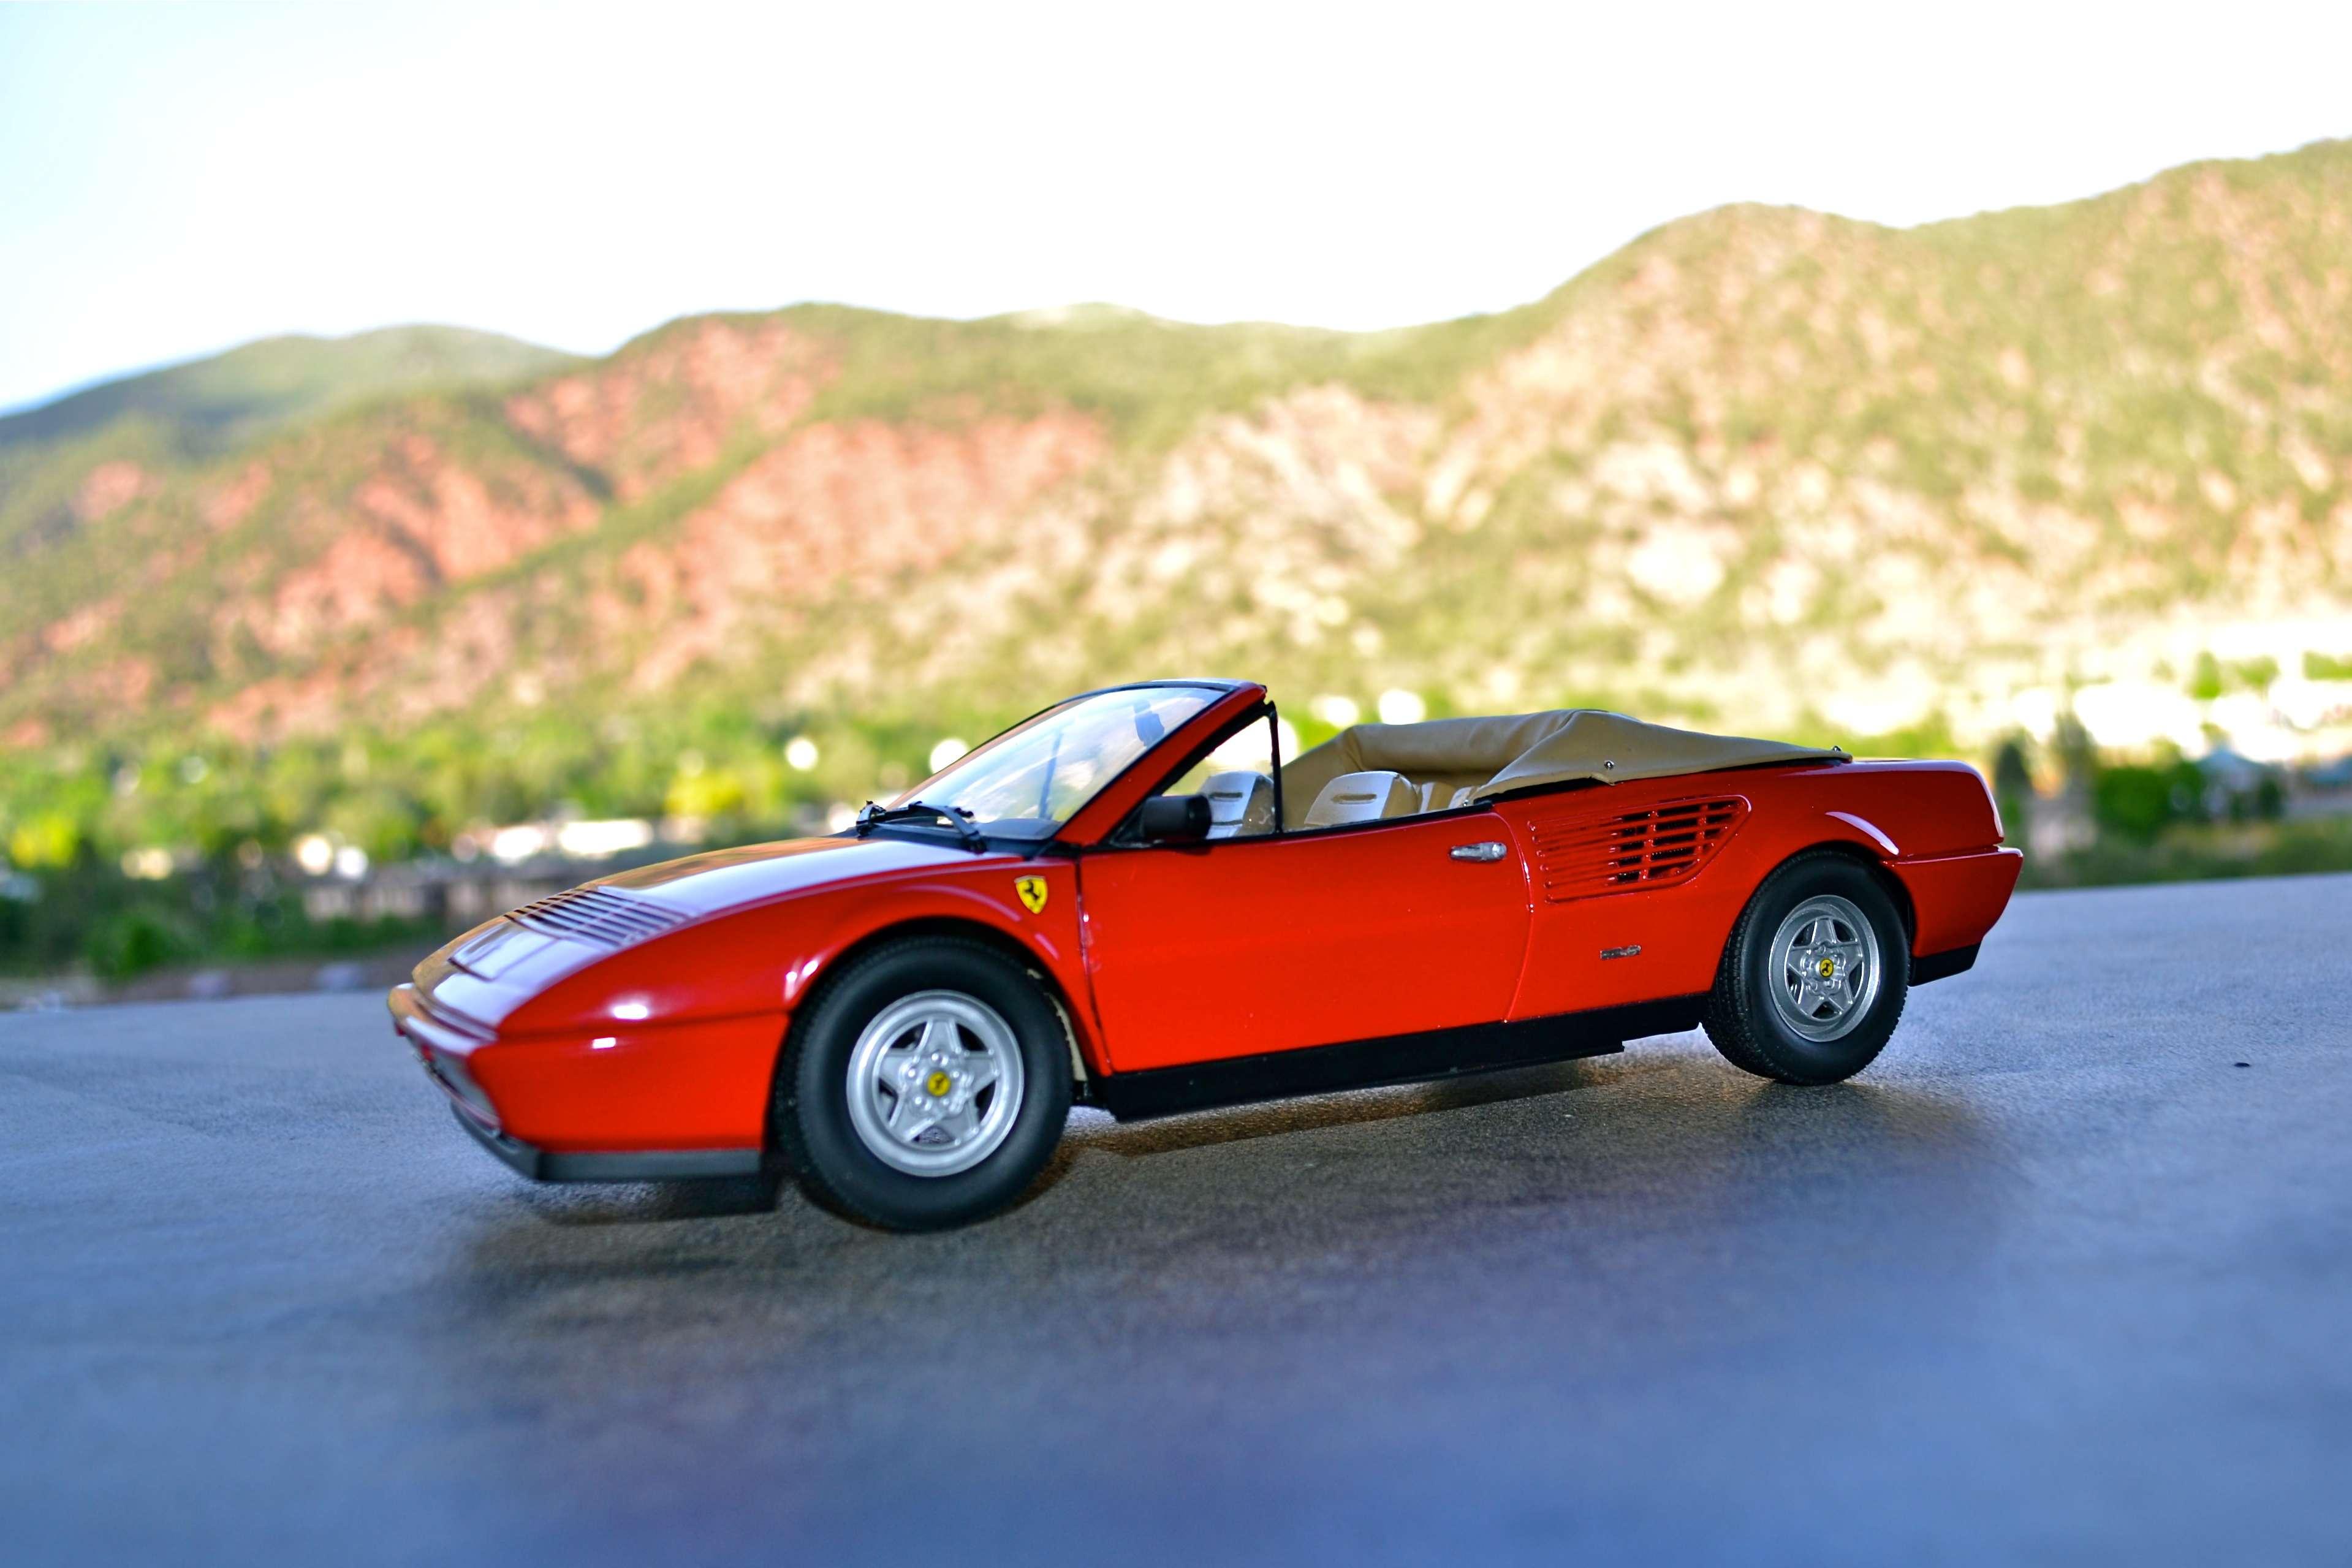 dsc1177b Fabulous Ferrari Mondial 8 Super Elite Cars Trend